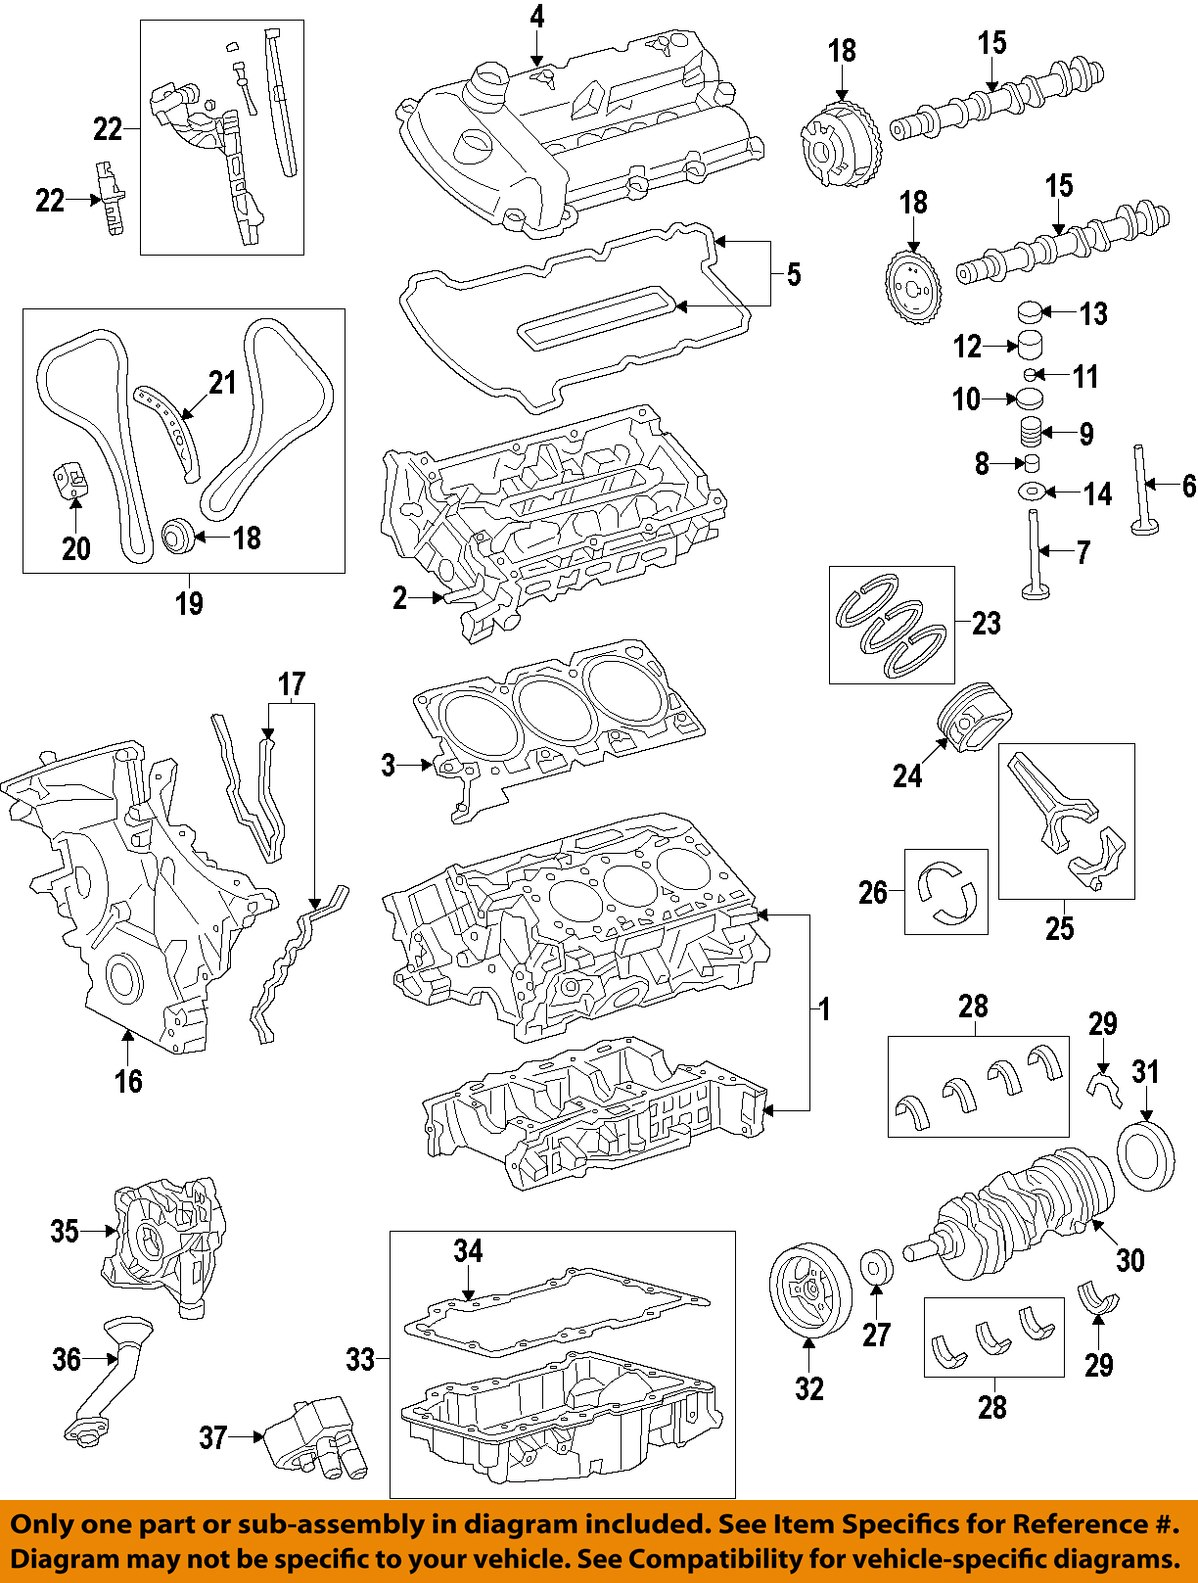 Jaguar 3 0 Cylender Engine Diagram Diy Enthusiasts Wiring Diagrams S Type 04 Enthusiast U2022 Rh Rasalibre Co 2002 X W Cooling Problems